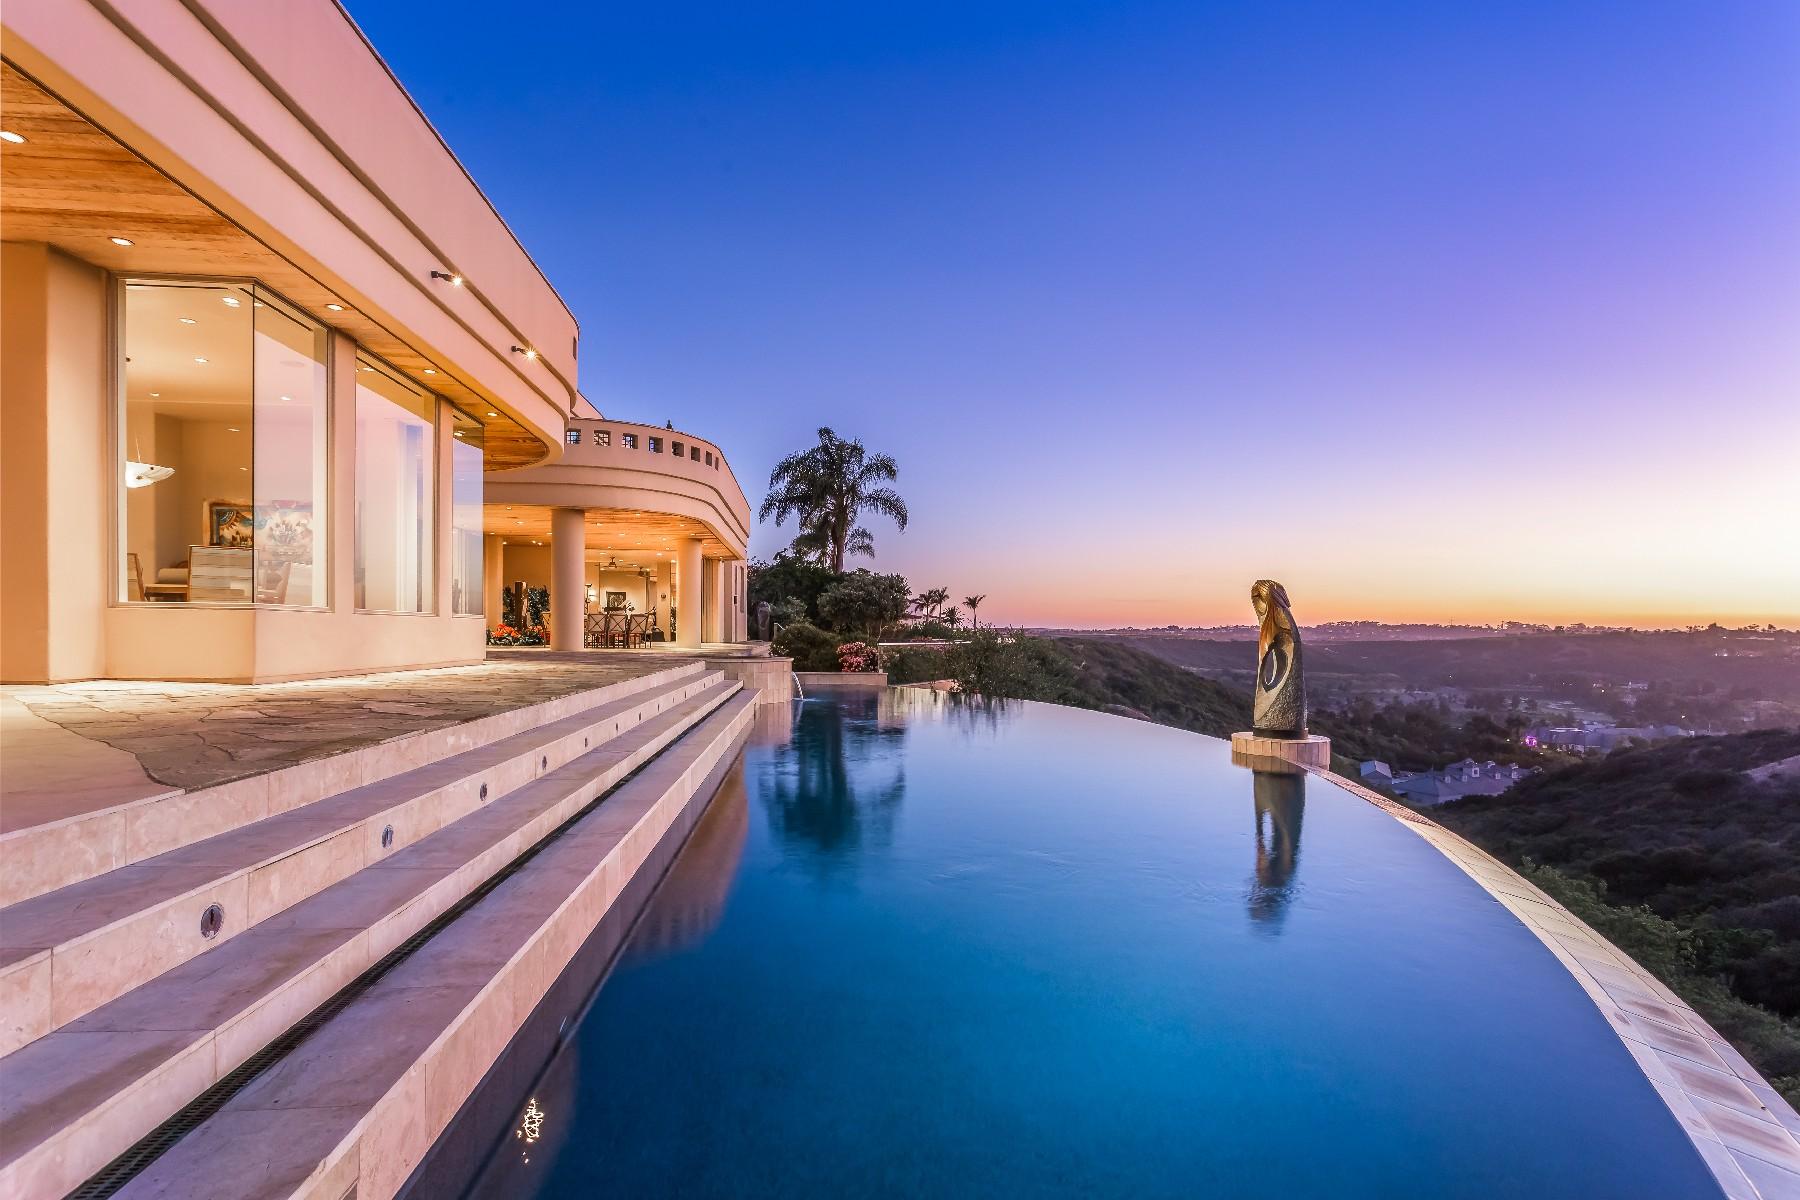 Single Family Home for Sale at 14630 Calle Diegueno Rancho Santa Fe, California 92067 United States